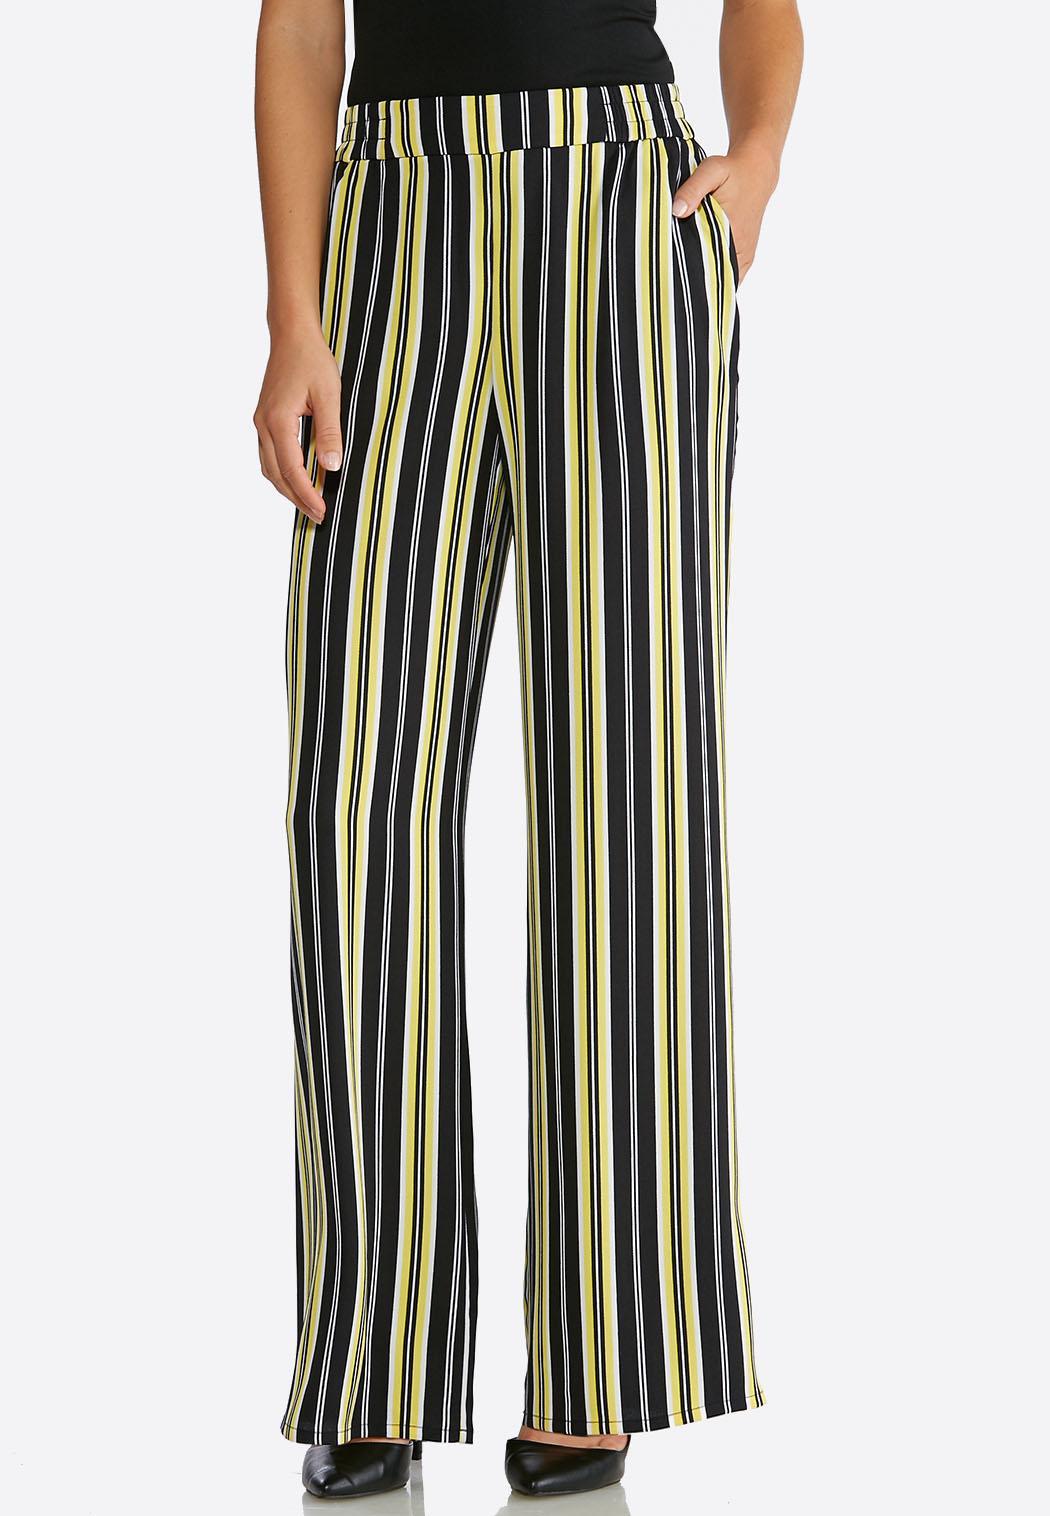 Petite Black And Yellow Stripe Pants